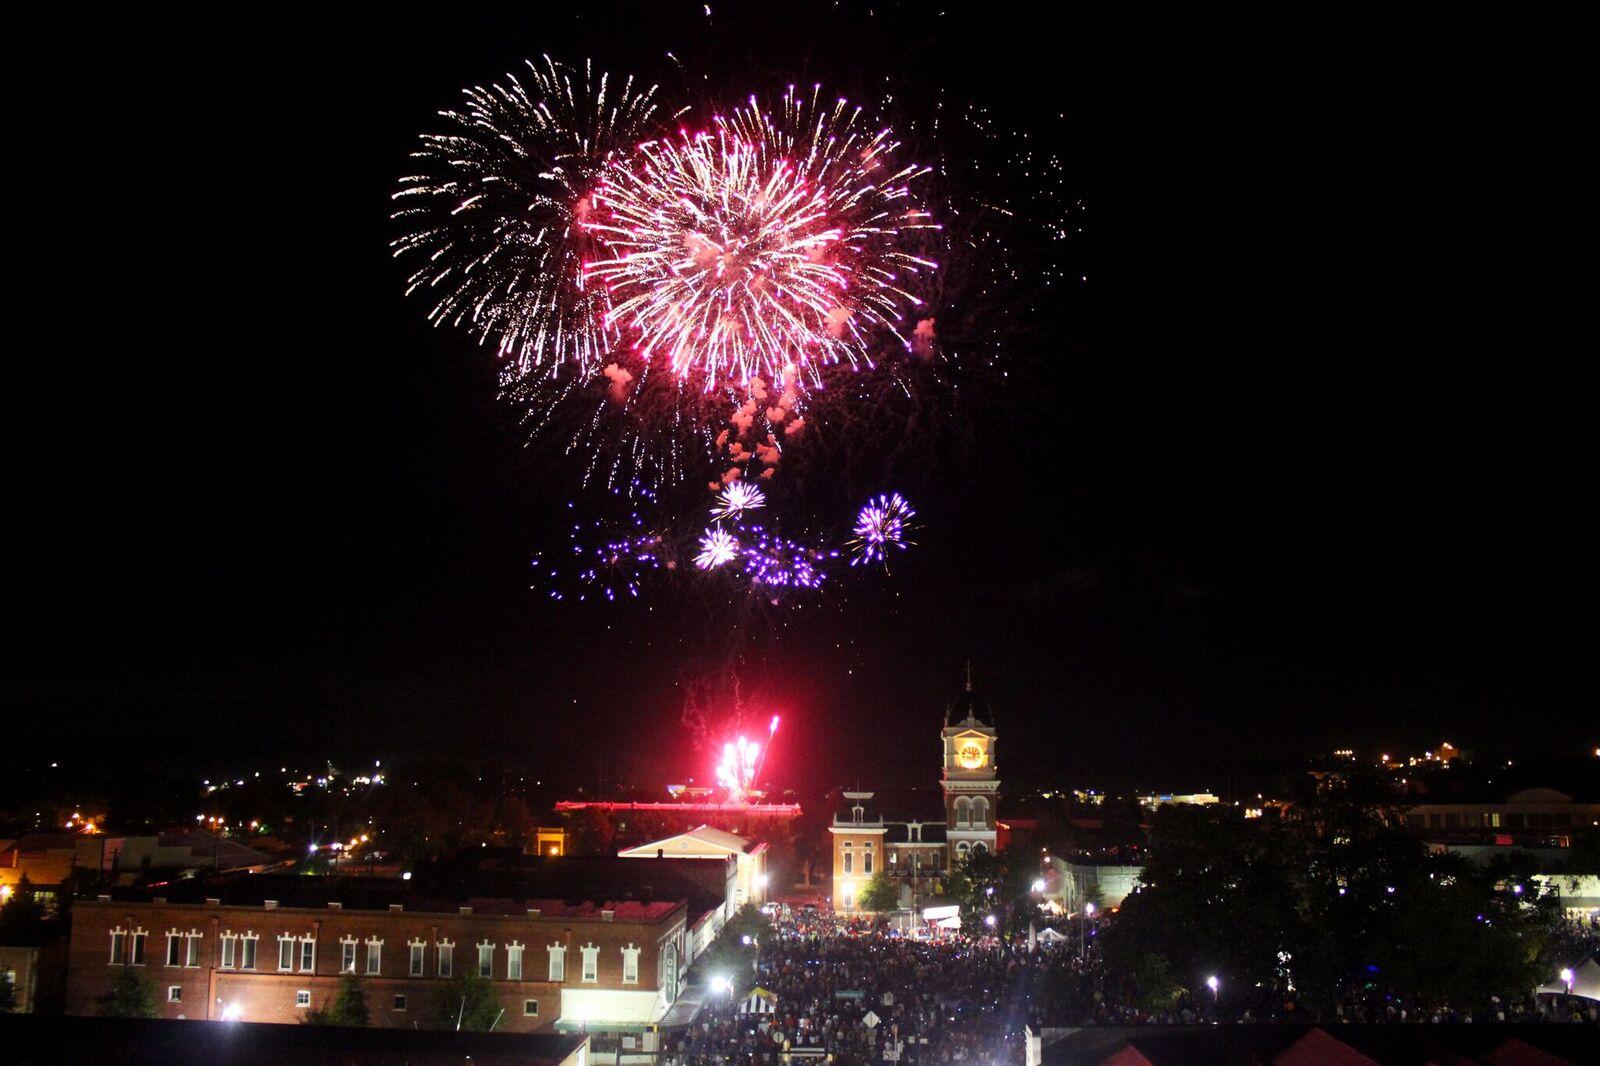 July 4 Fireworks Above Town Square, Covington Georgia